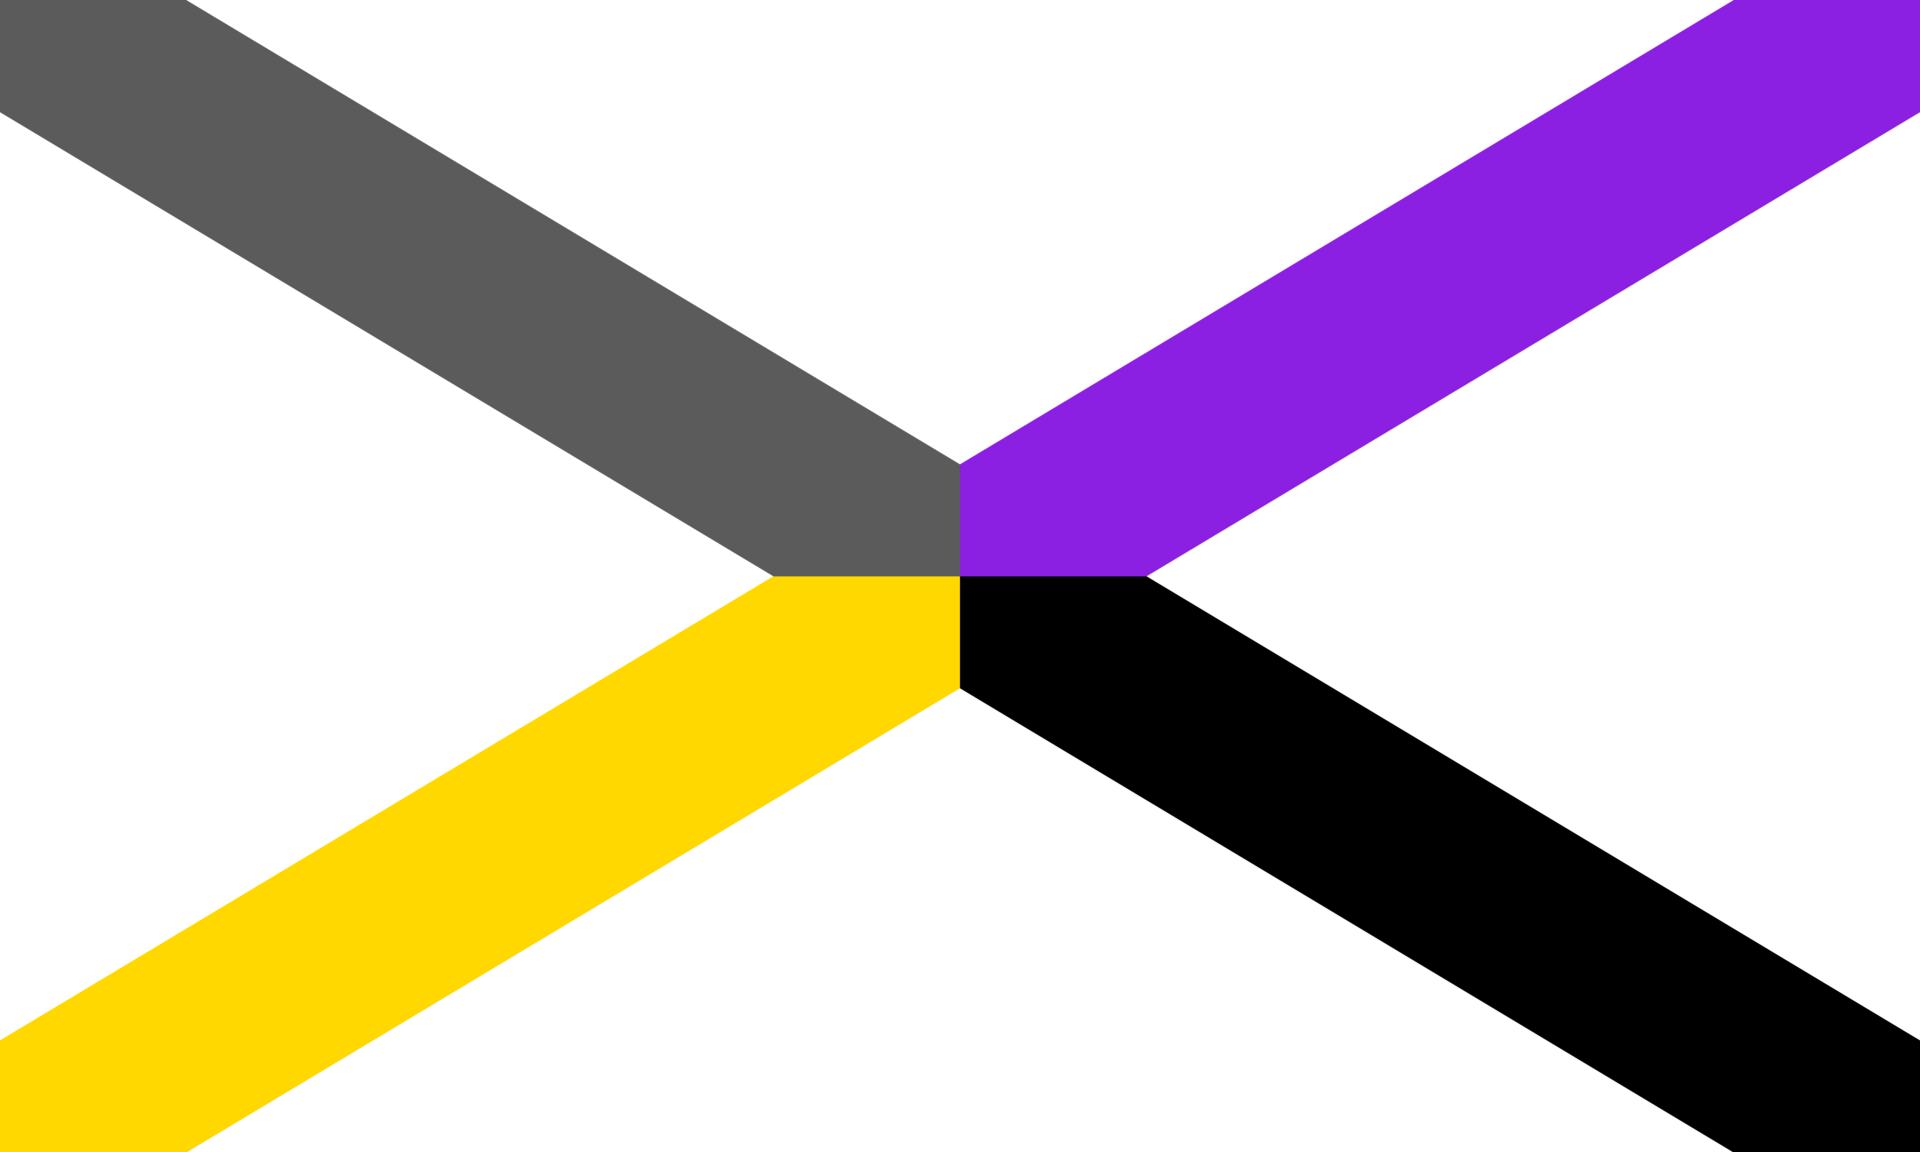 https://static.miraheze.org/nonbinarywiki/thumb/e/e9/X-gender.png/1920px-X-gender.png